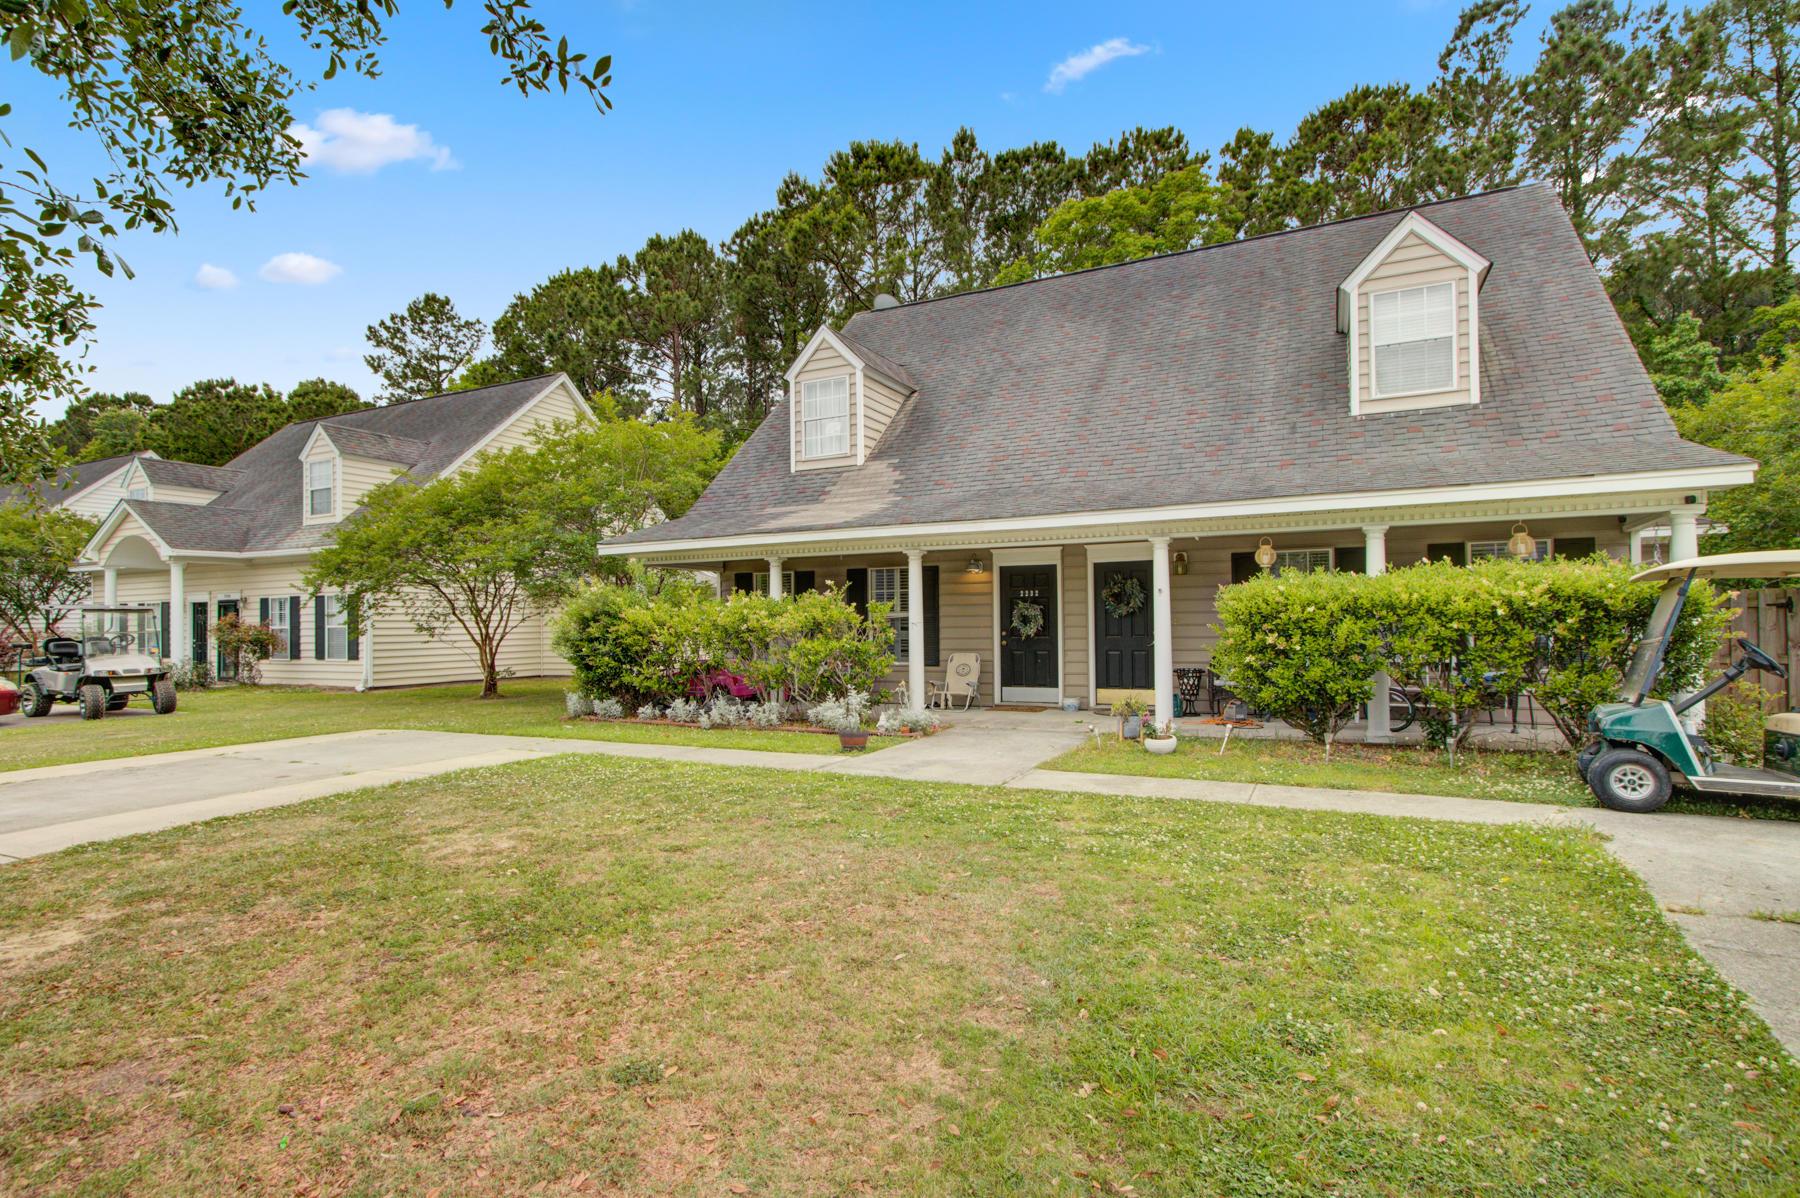 Dunes West Homes For Sale - 2232 Kings Gate, Mount Pleasant, SC - 25